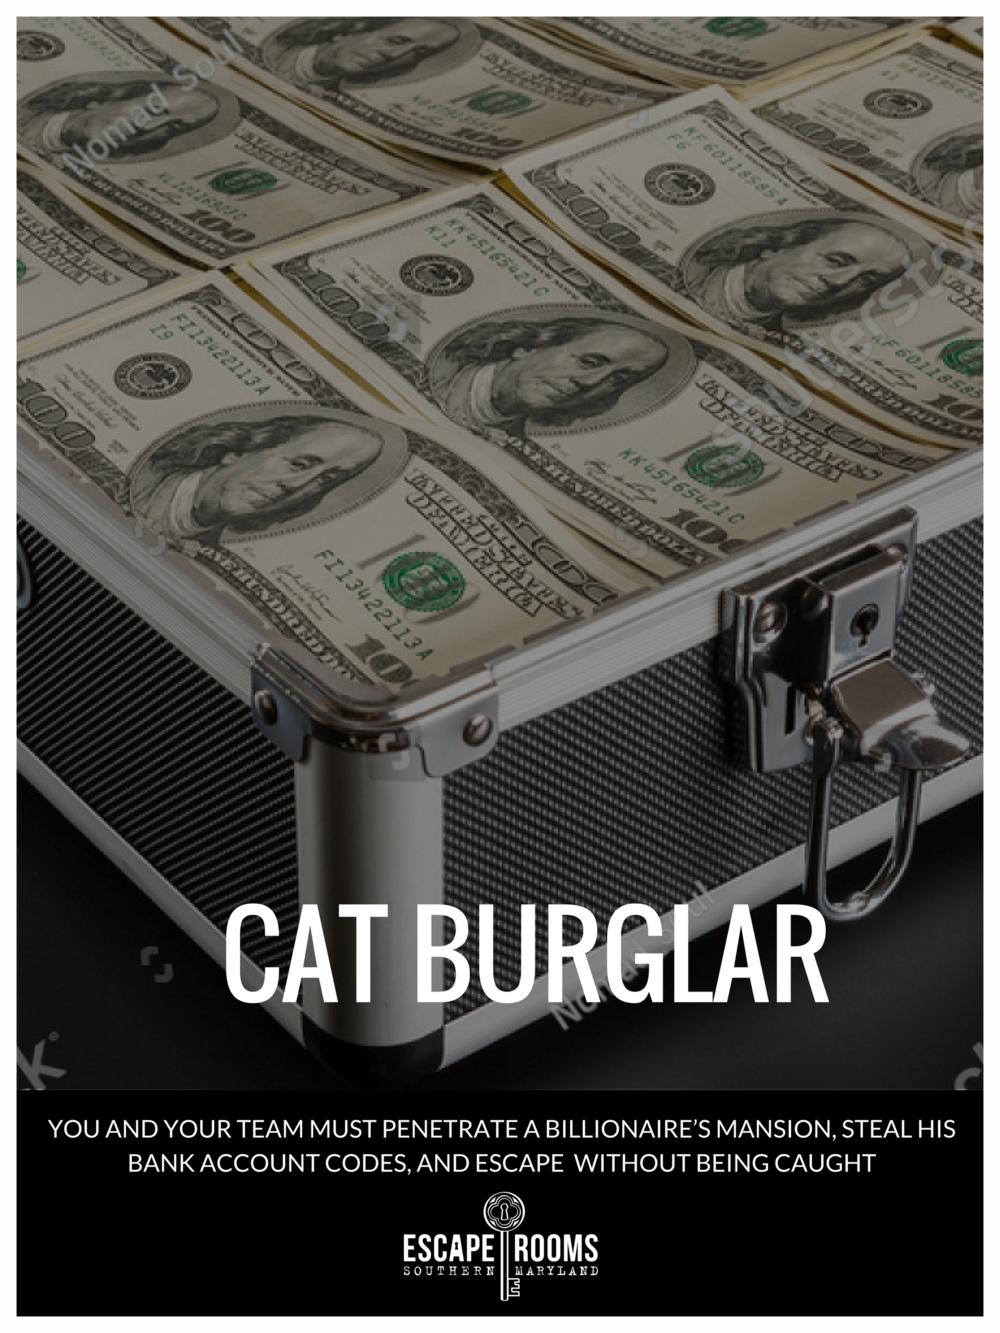 Cat Burglar escape room poster featuring a brief case full of cash and passports.